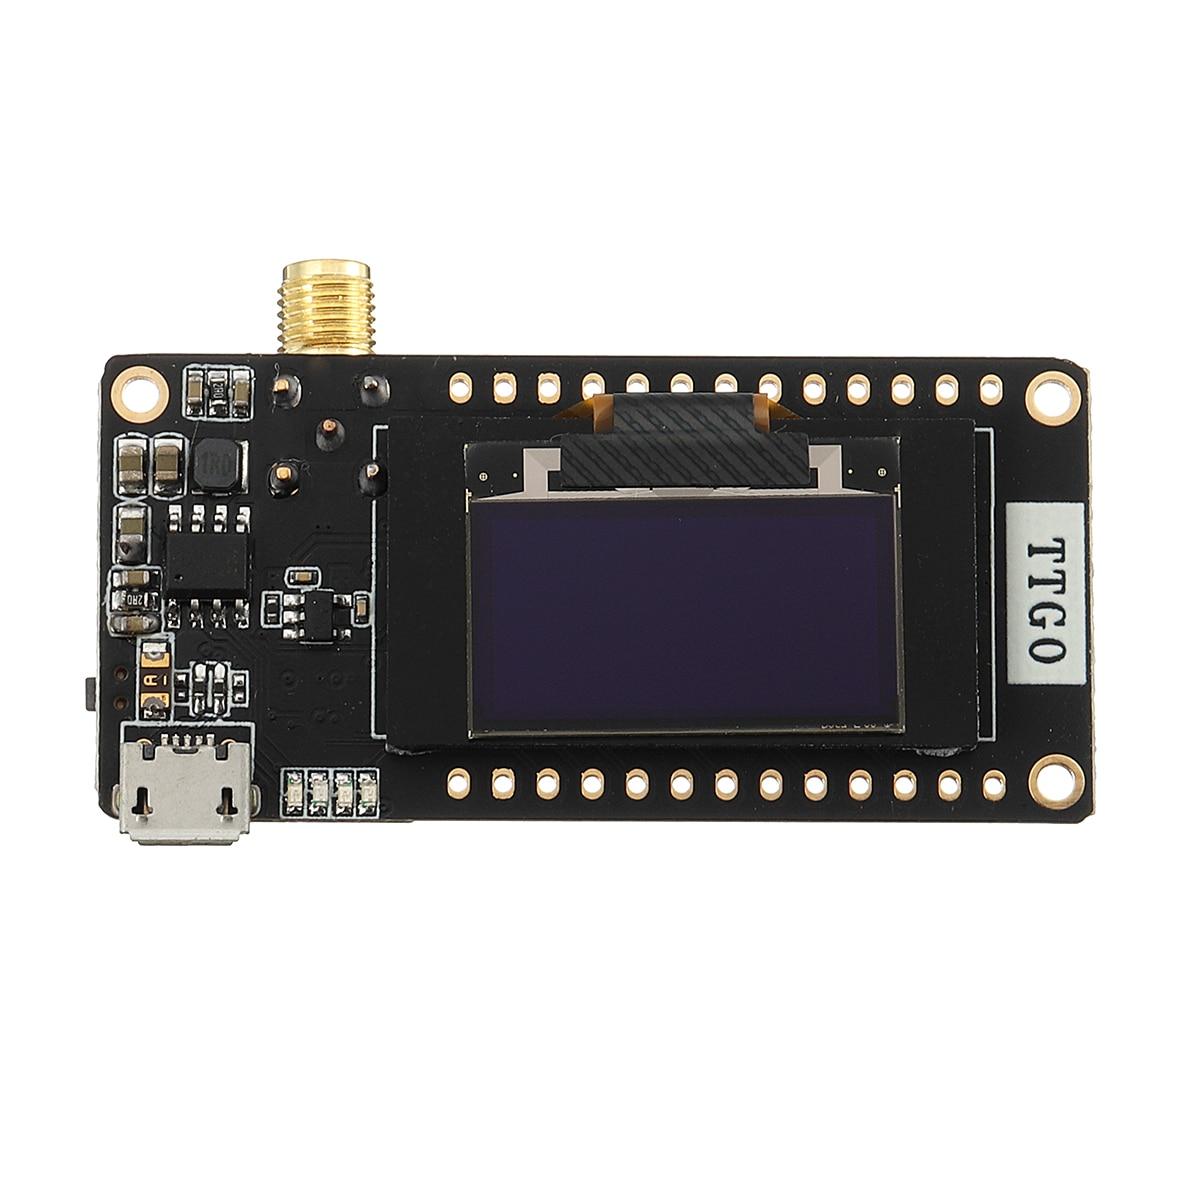 LoRa32 V2.1 868 Mhz ESP32 LoRa OLED 0.96 pouces carte SD bluetooth WIFI Module sans filLoRa32 V2.1 868 Mhz ESP32 LoRa OLED 0.96 pouces carte SD bluetooth WIFI Module sans fil